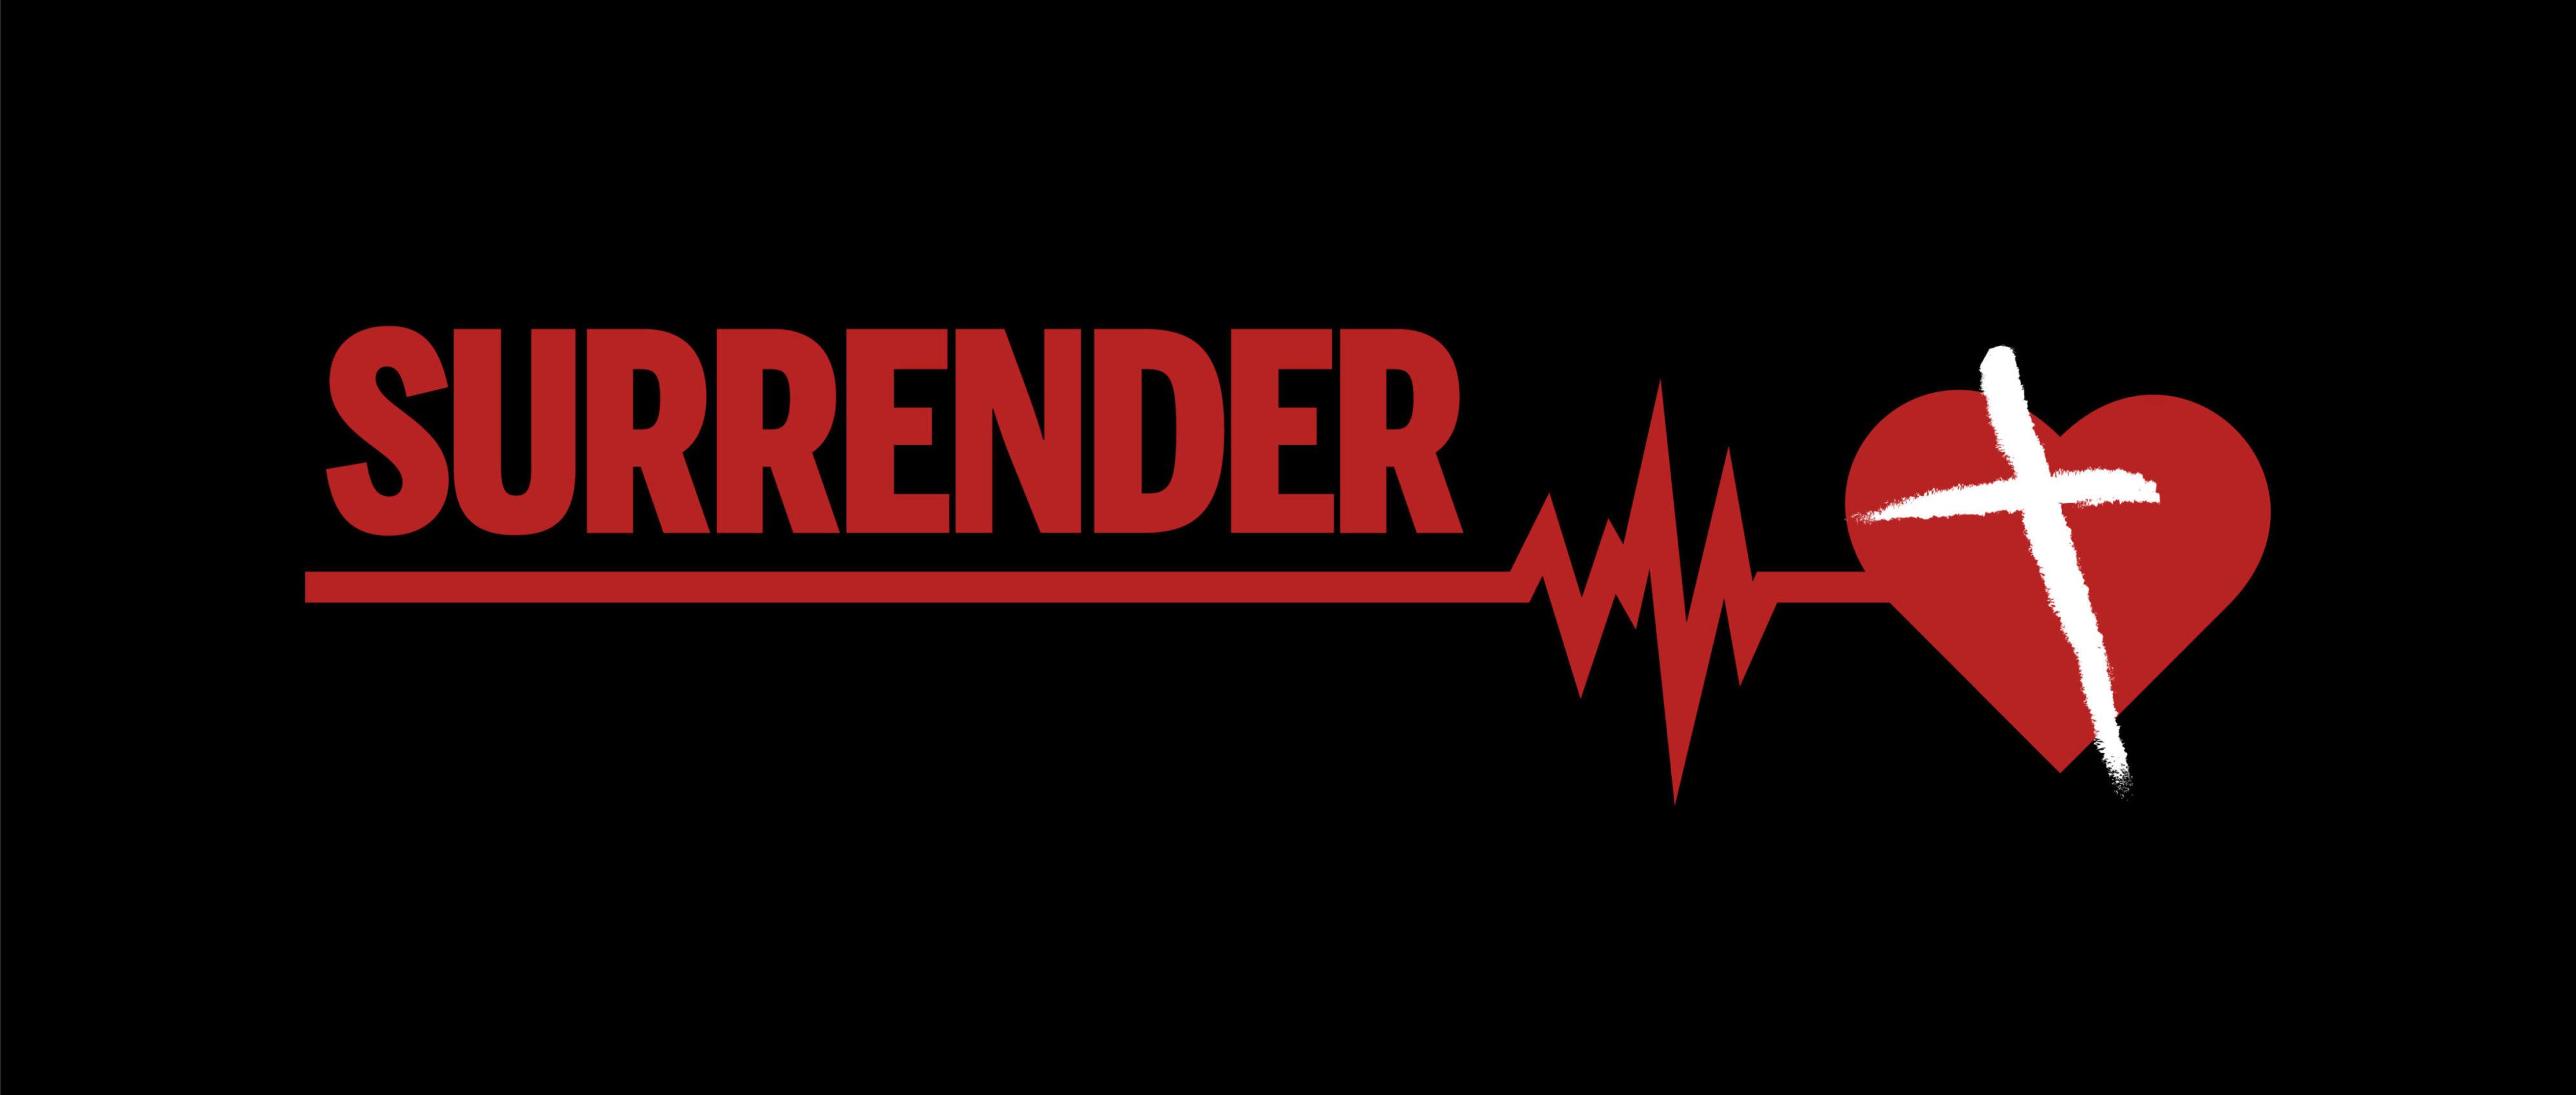 SurrenderRedBlack